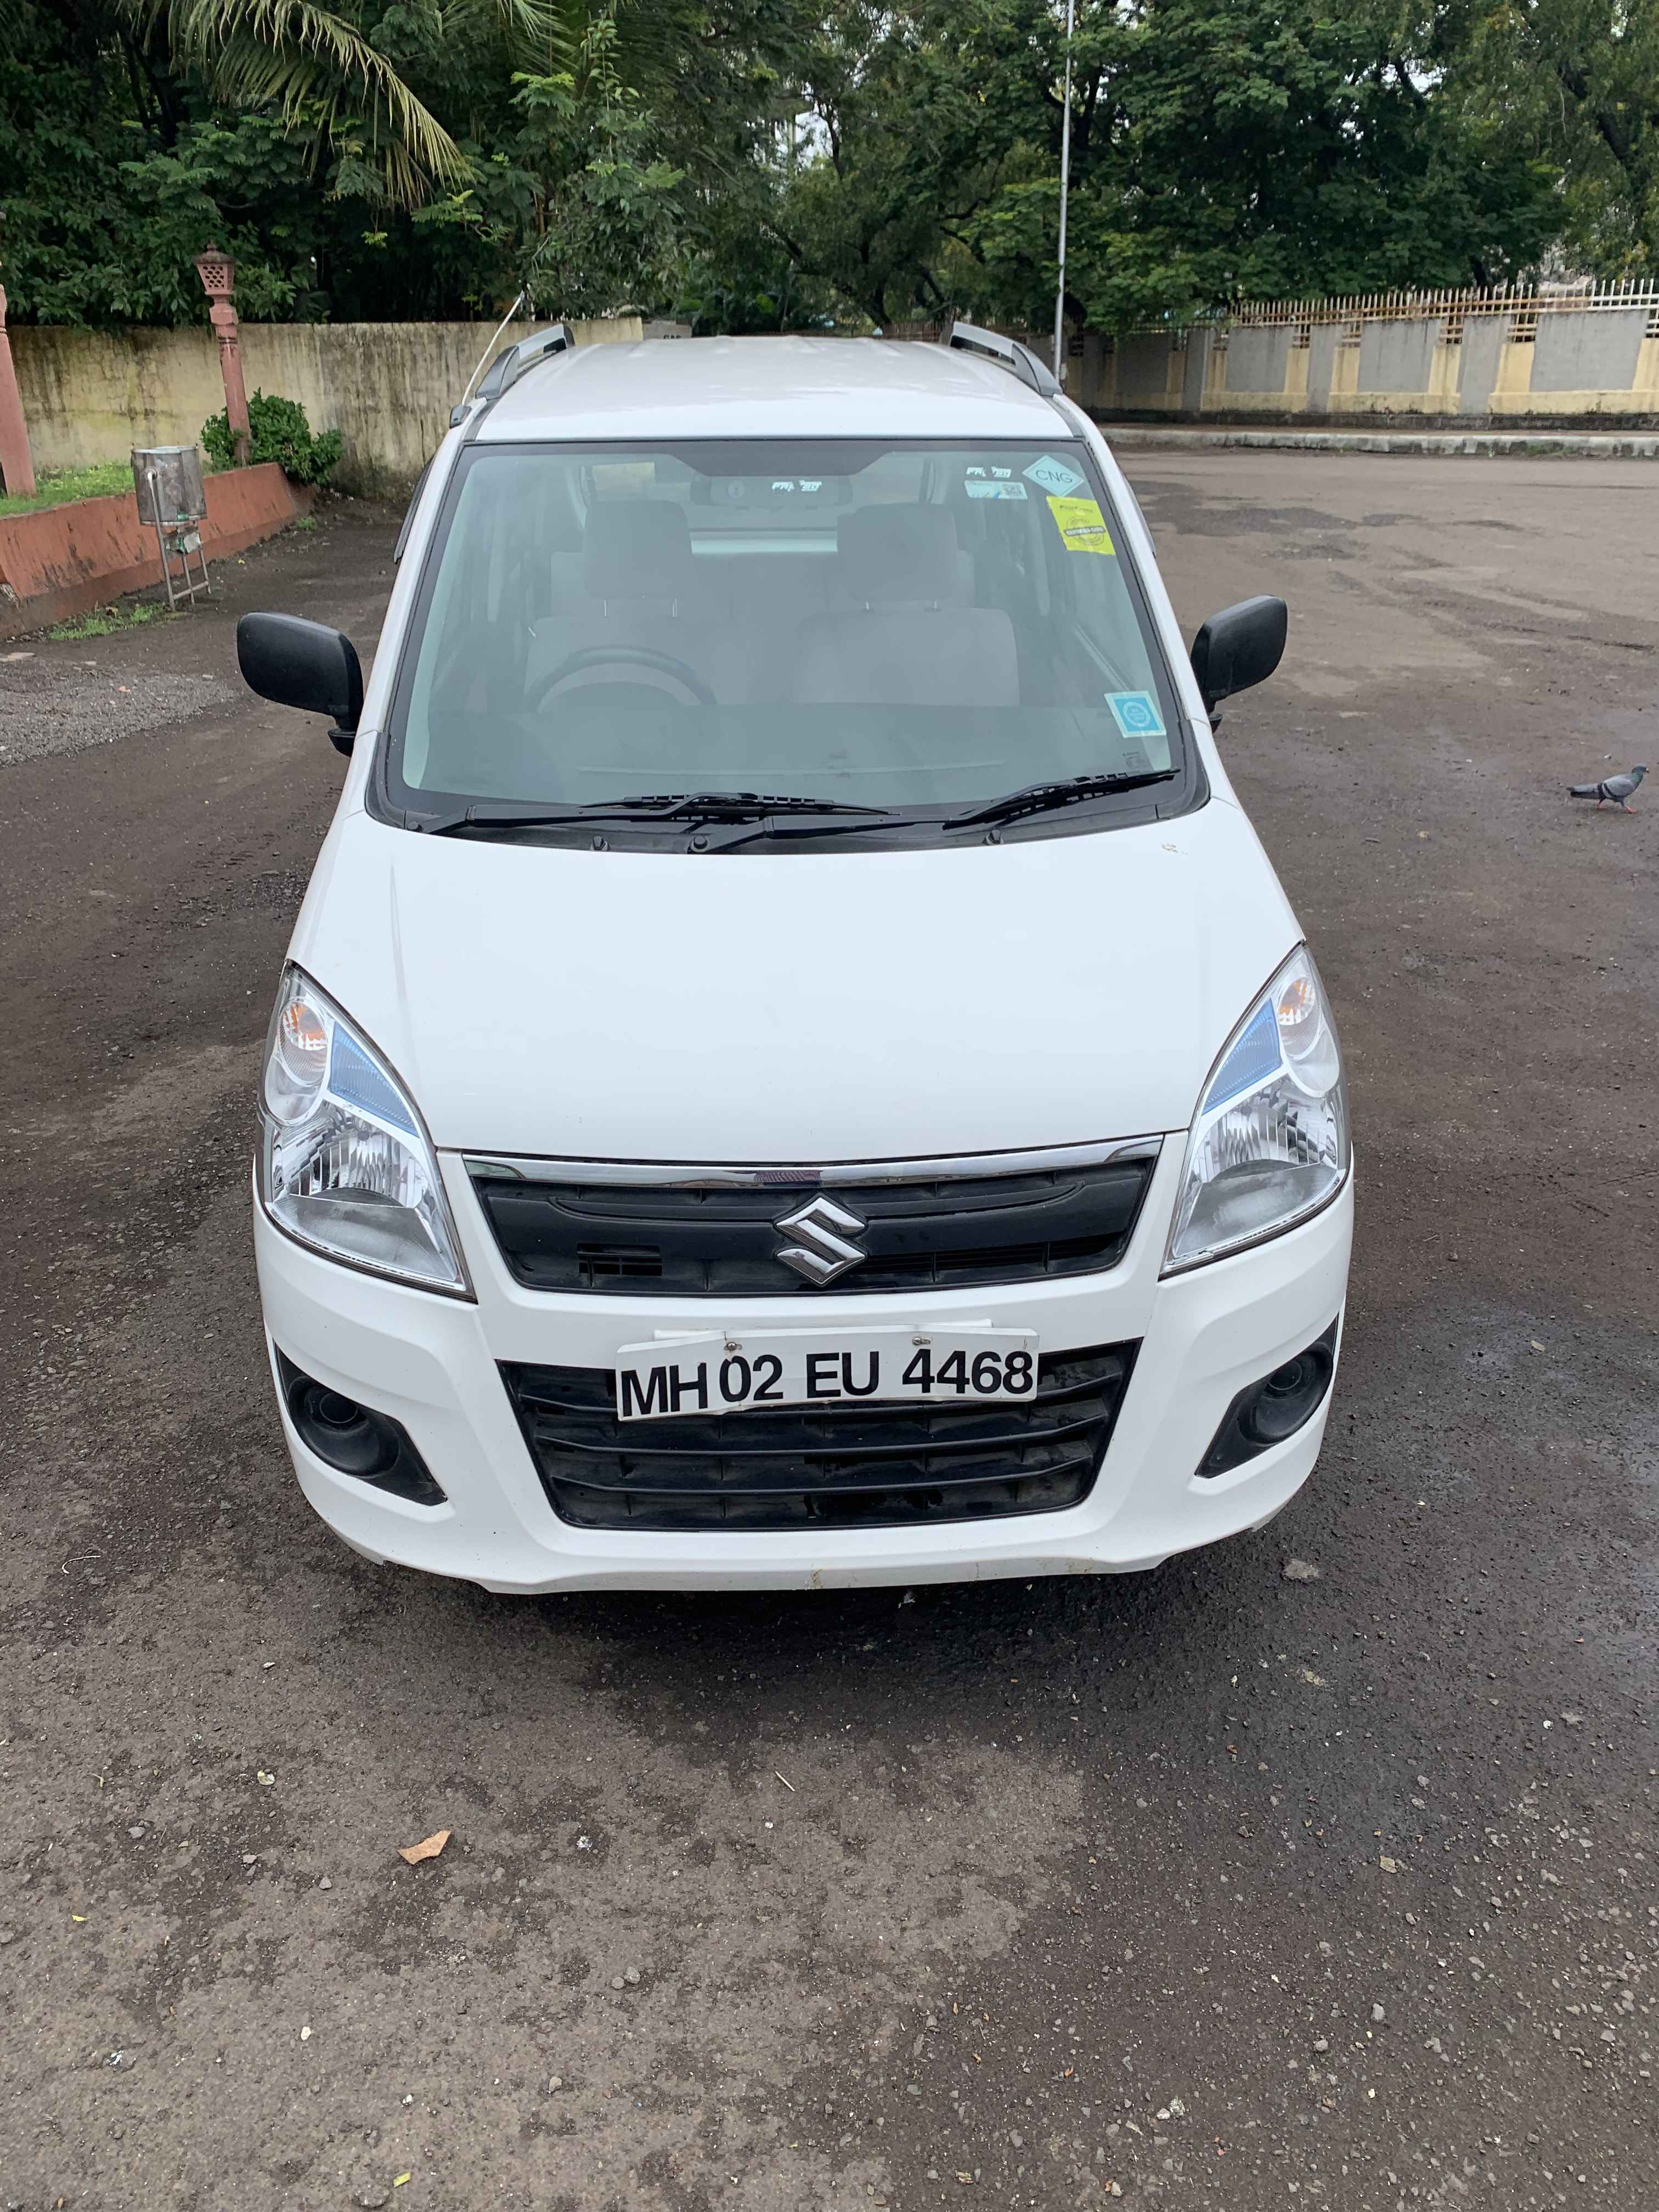 Used Cars Under 4 To 5 Lakh In Navi Mumbai Mahindra First Choice Wheels